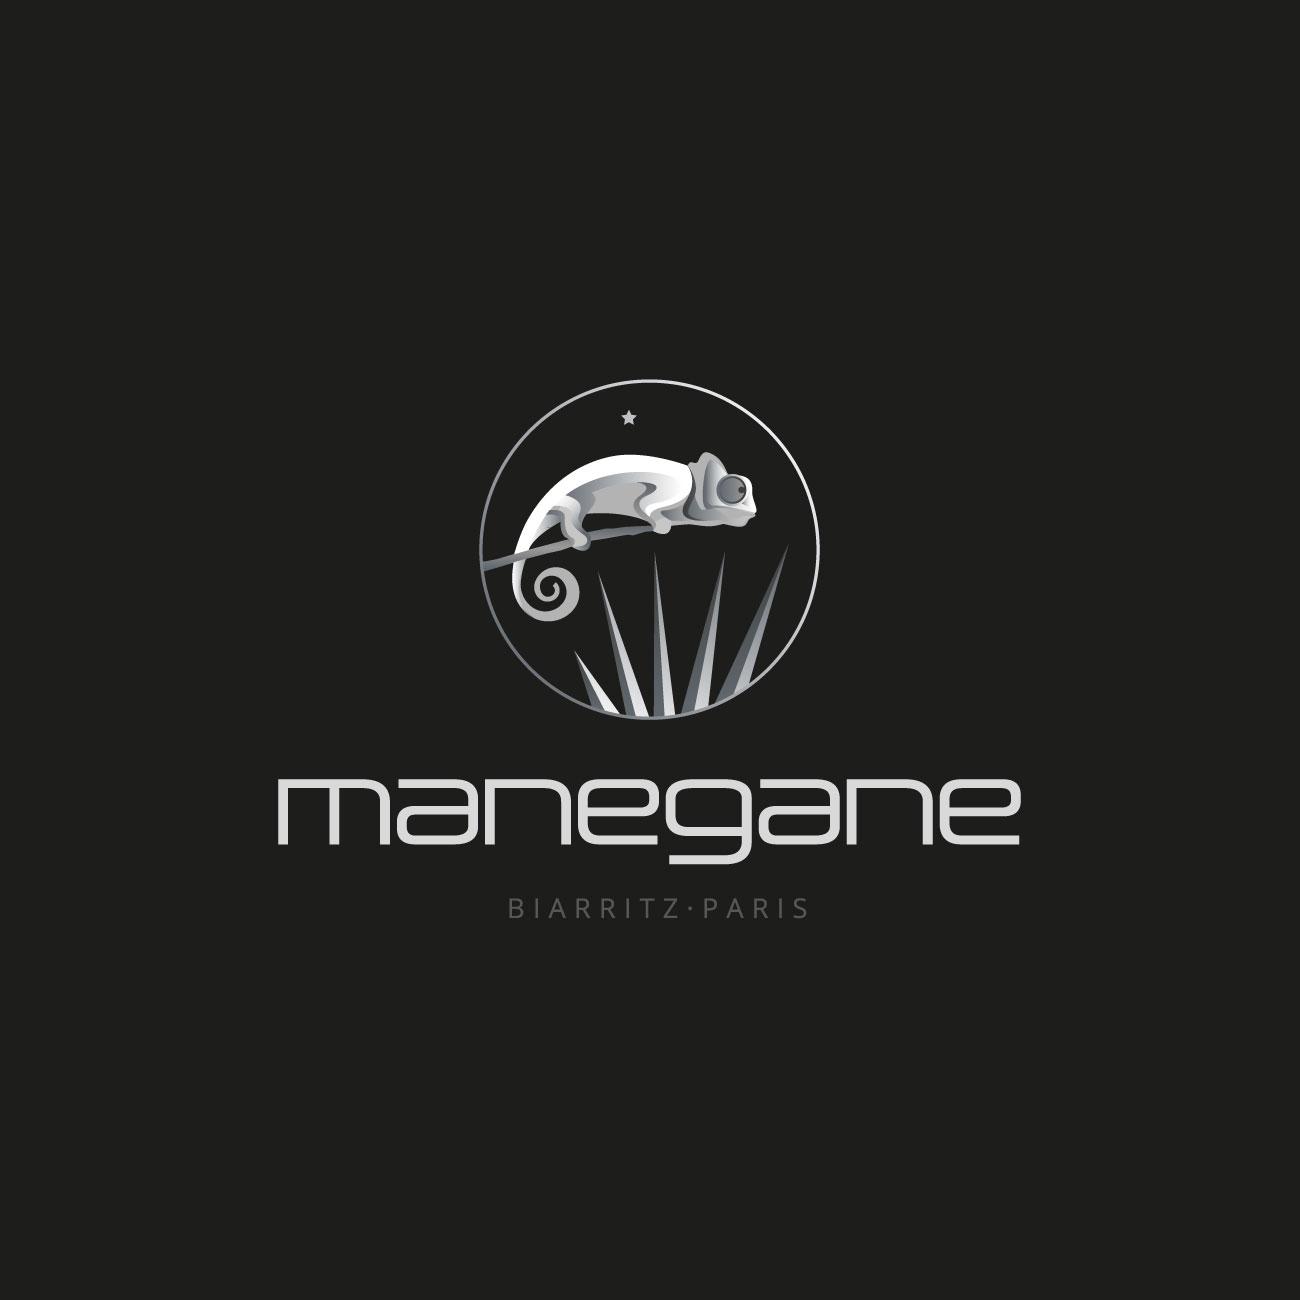 Aitana-Design-Manegane-3